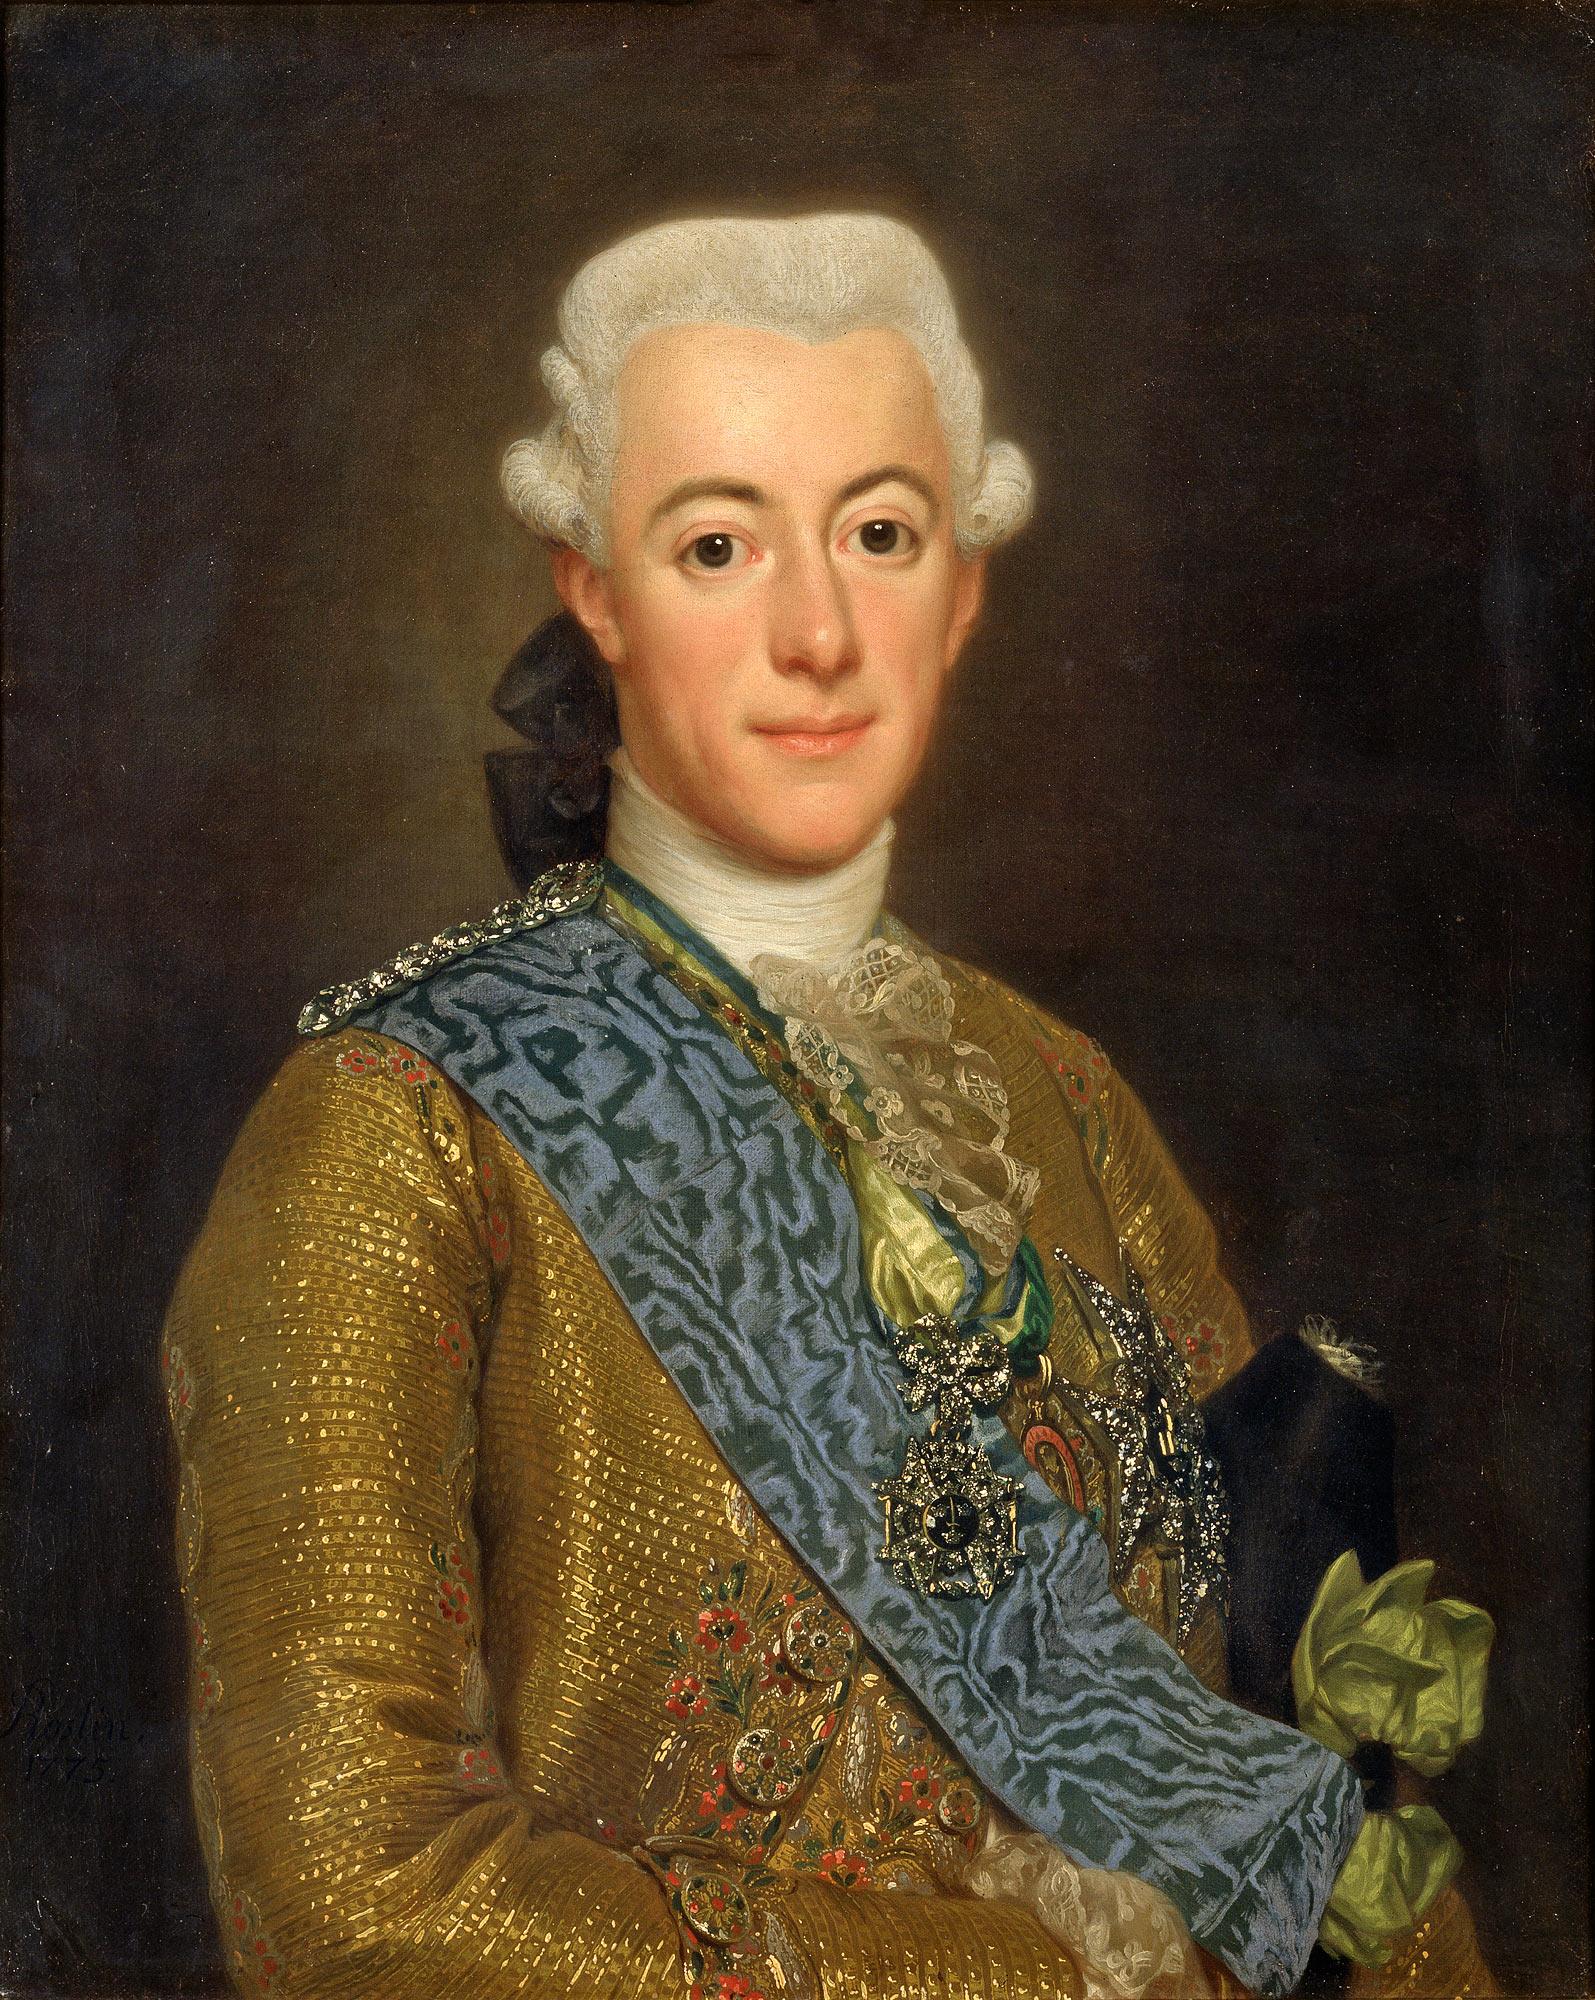 Alexander_Roslin_-_Gustav_III.jpg